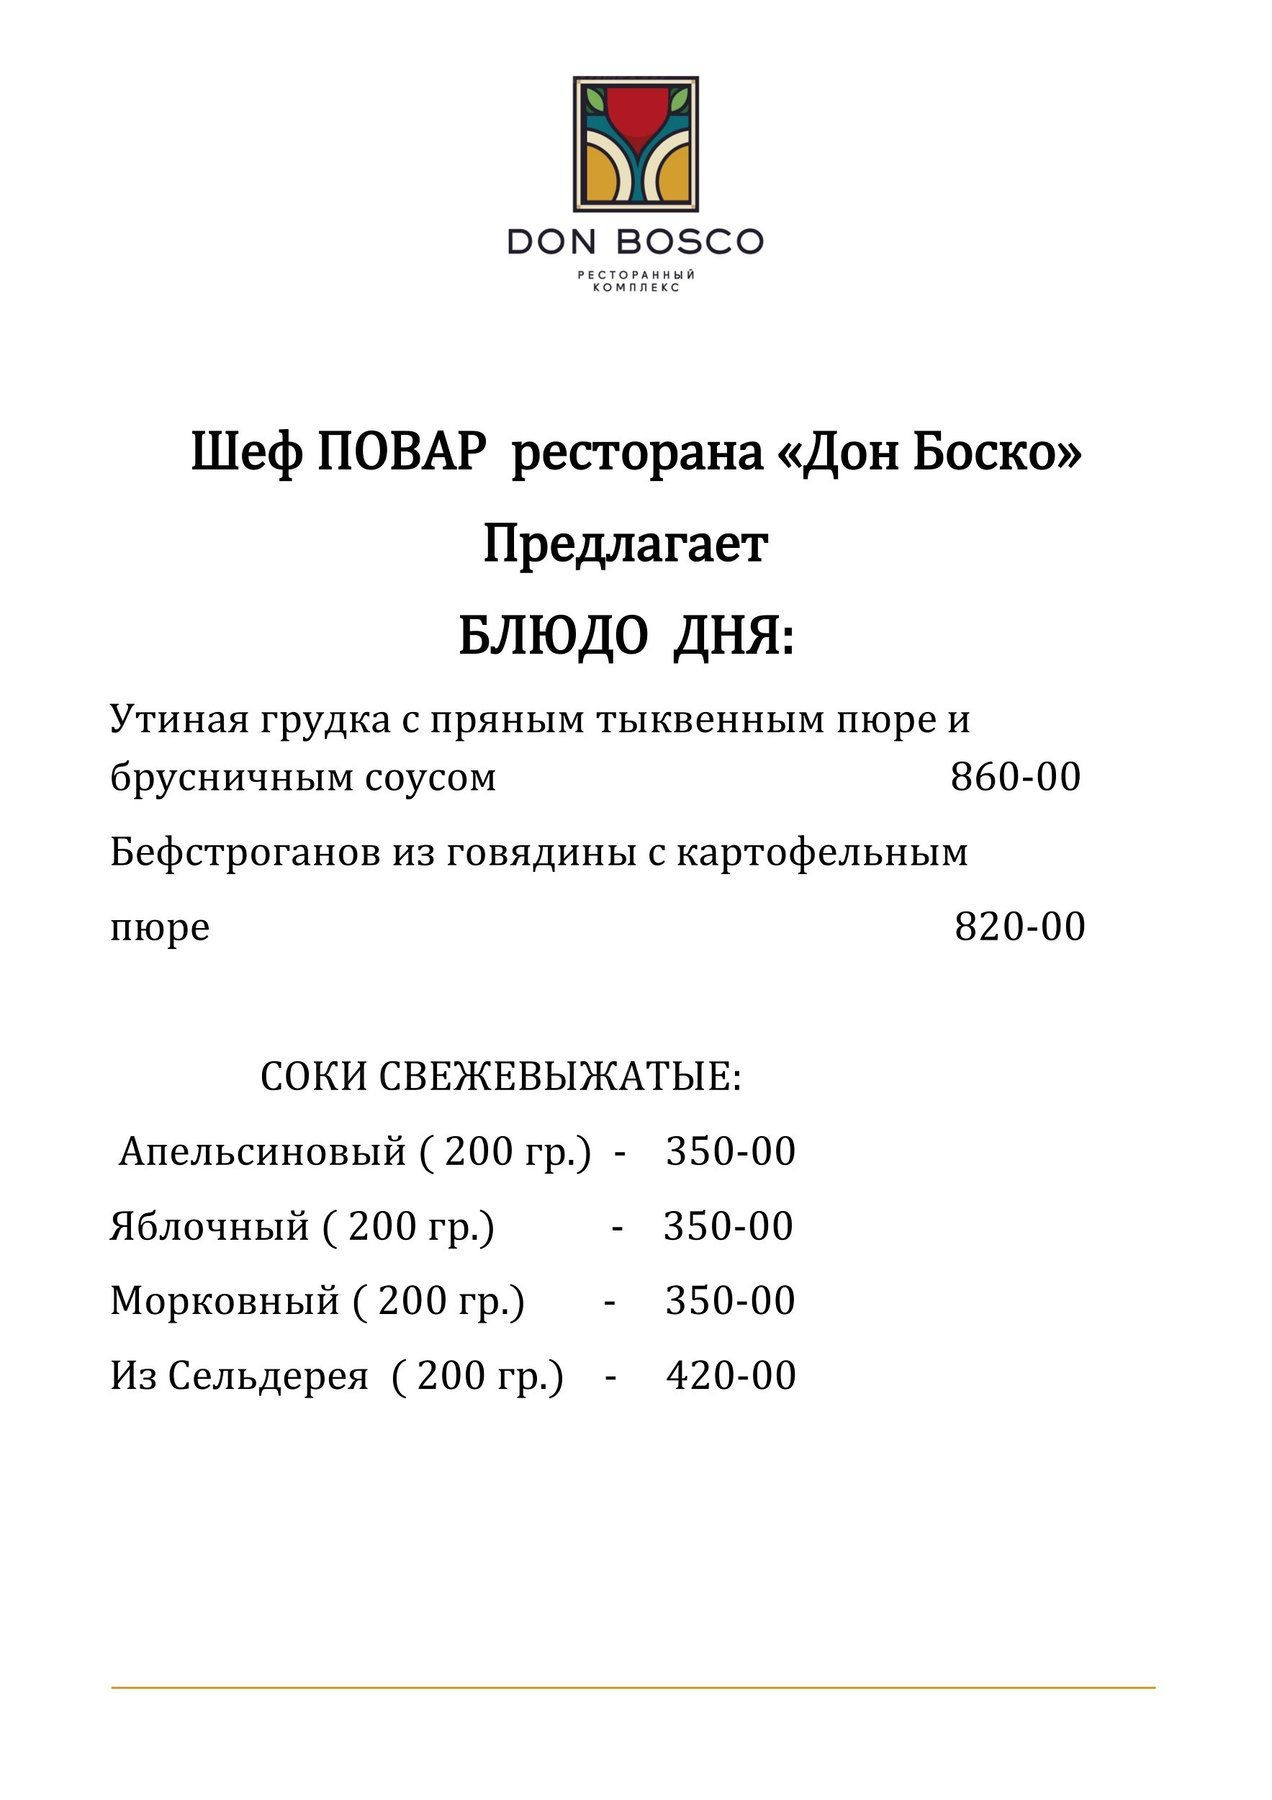 Меню ресторана Дон Боско (Don Bosco) на Новгородской фото 1